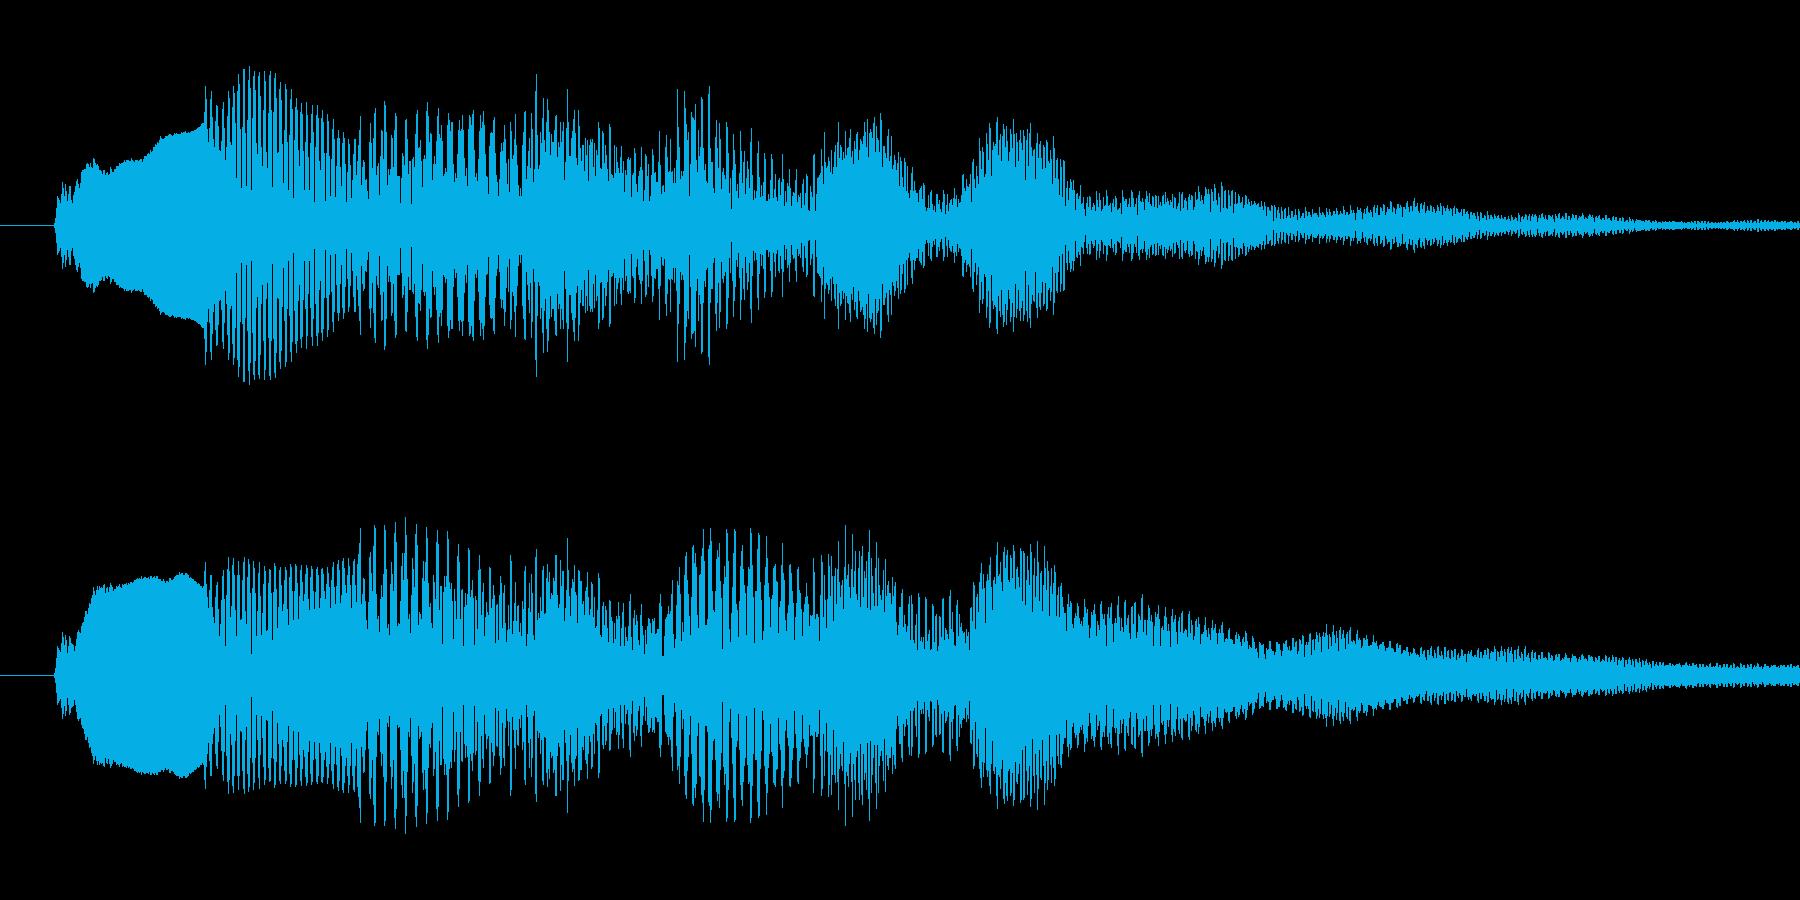 Musicboxによる着信音です。の再生済みの波形